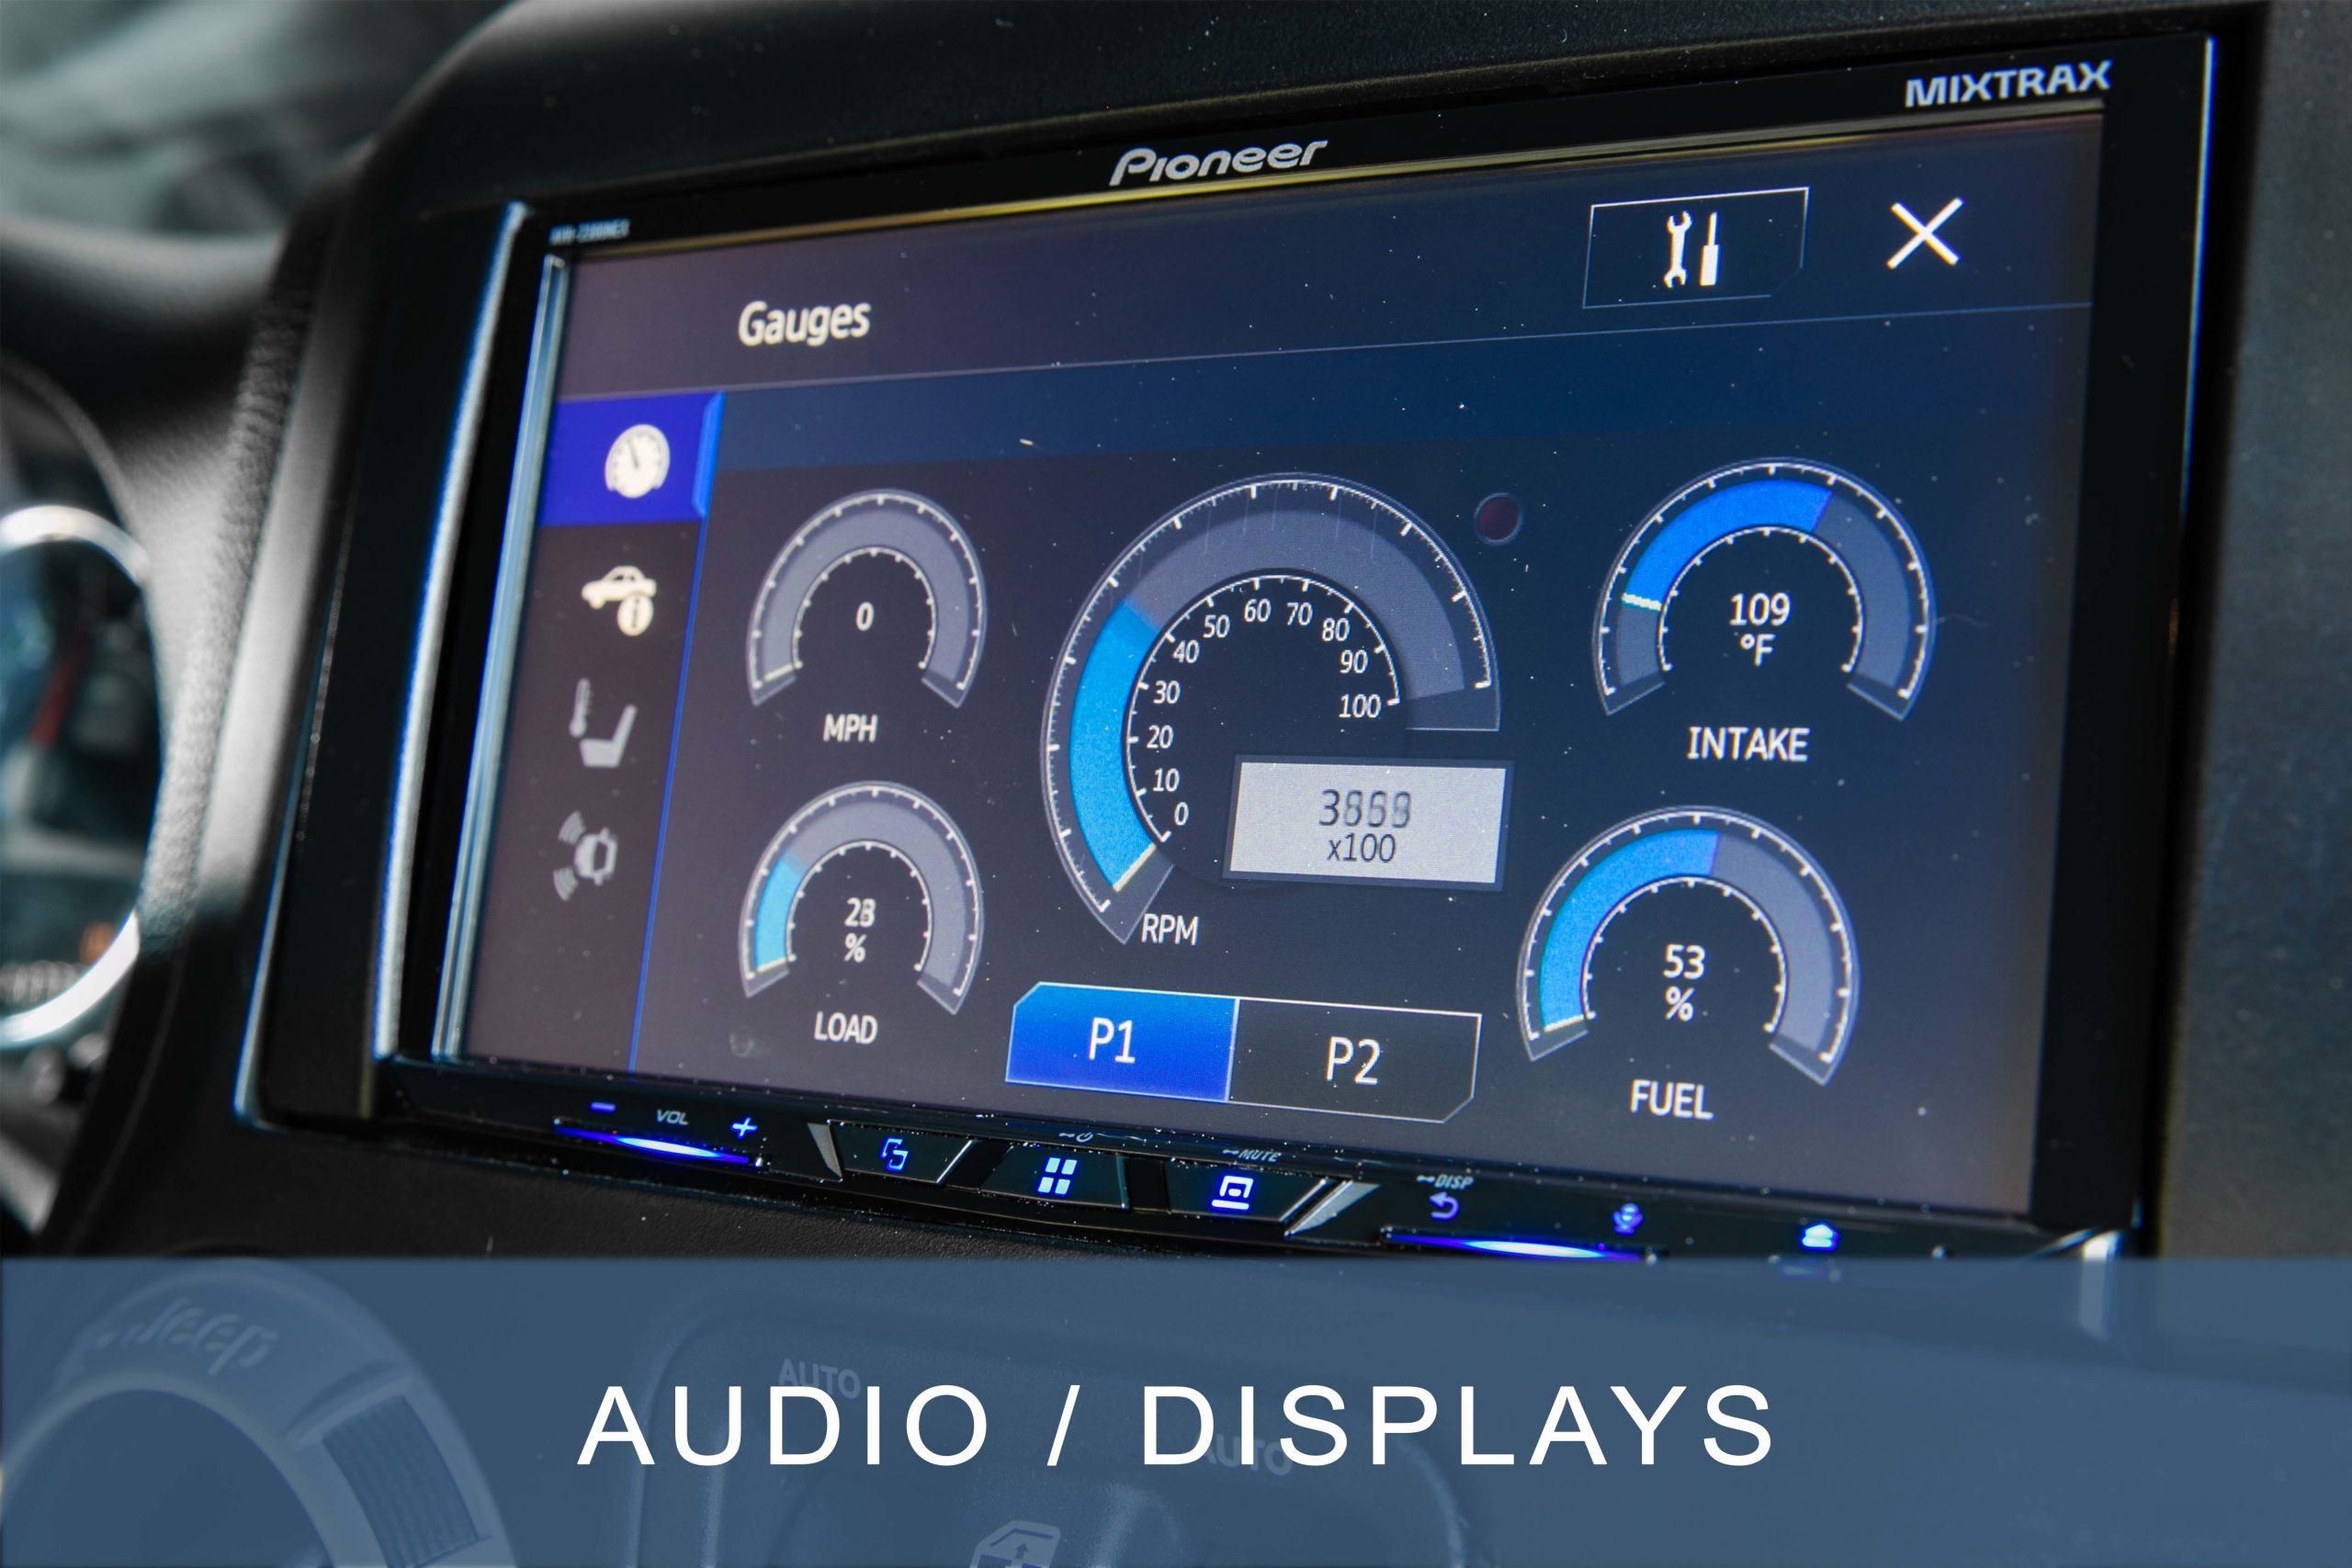 Audio - Displays